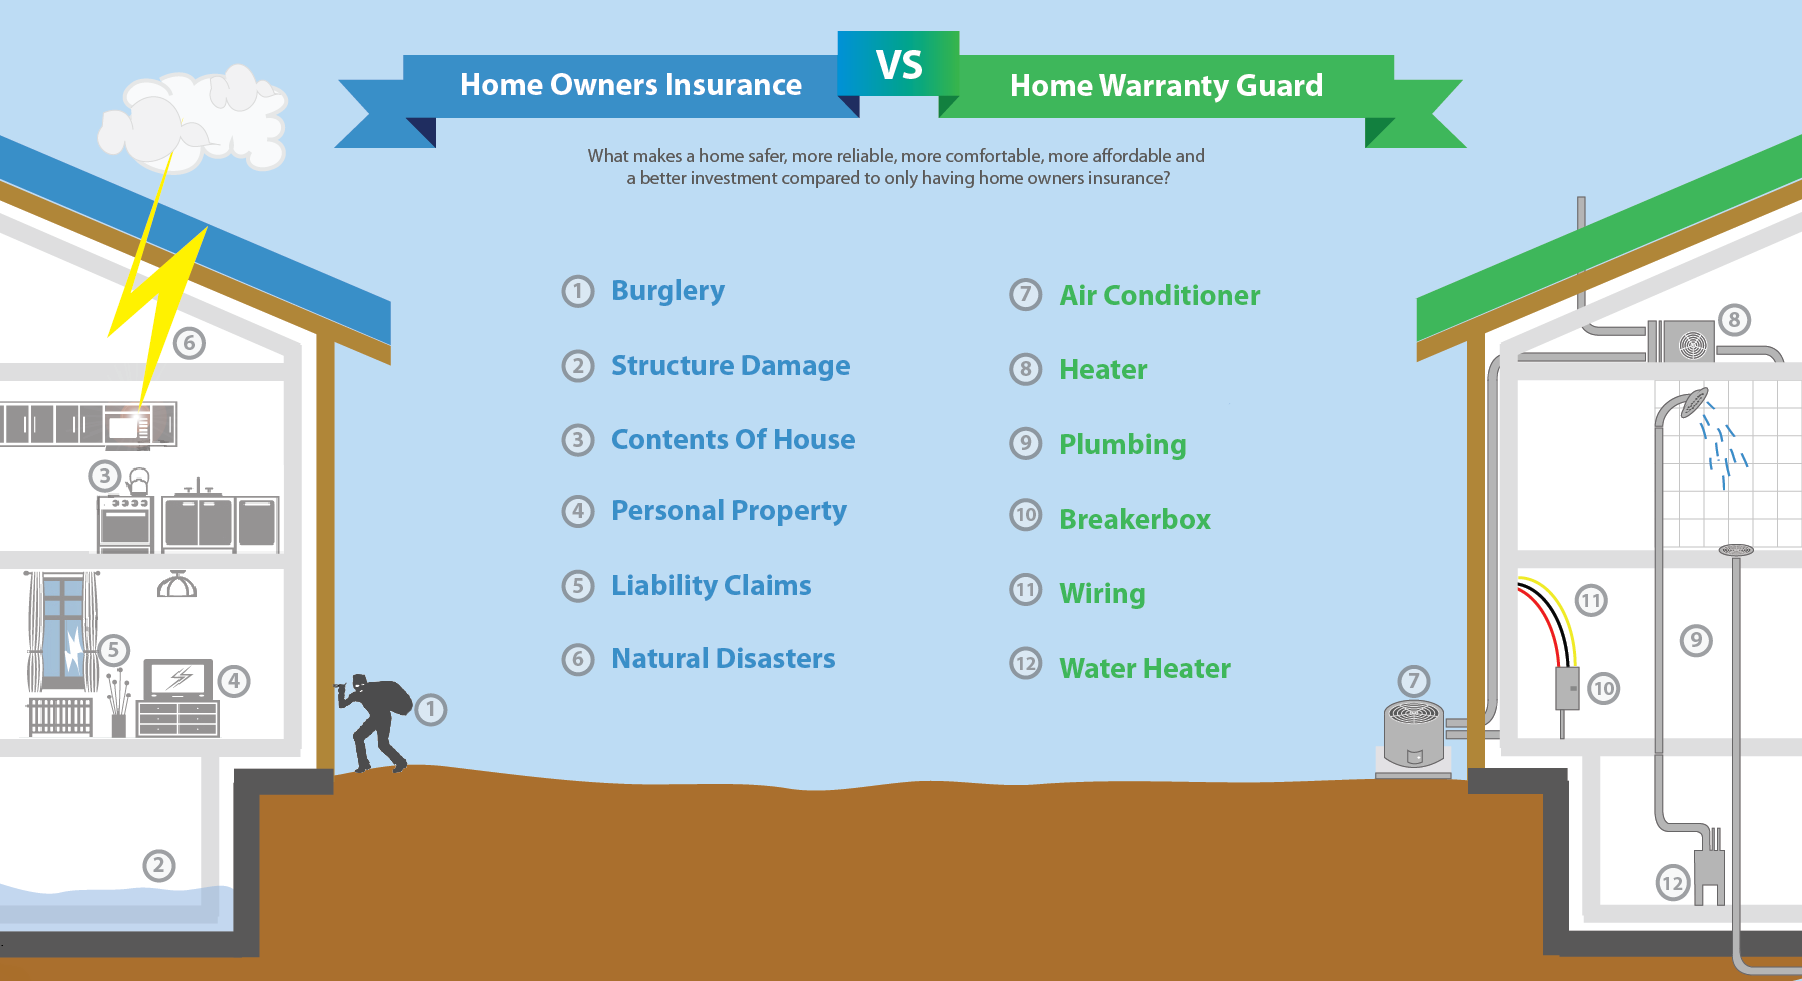 Homeowner S Insurance Vs Home Warranty Guard Home Warranty